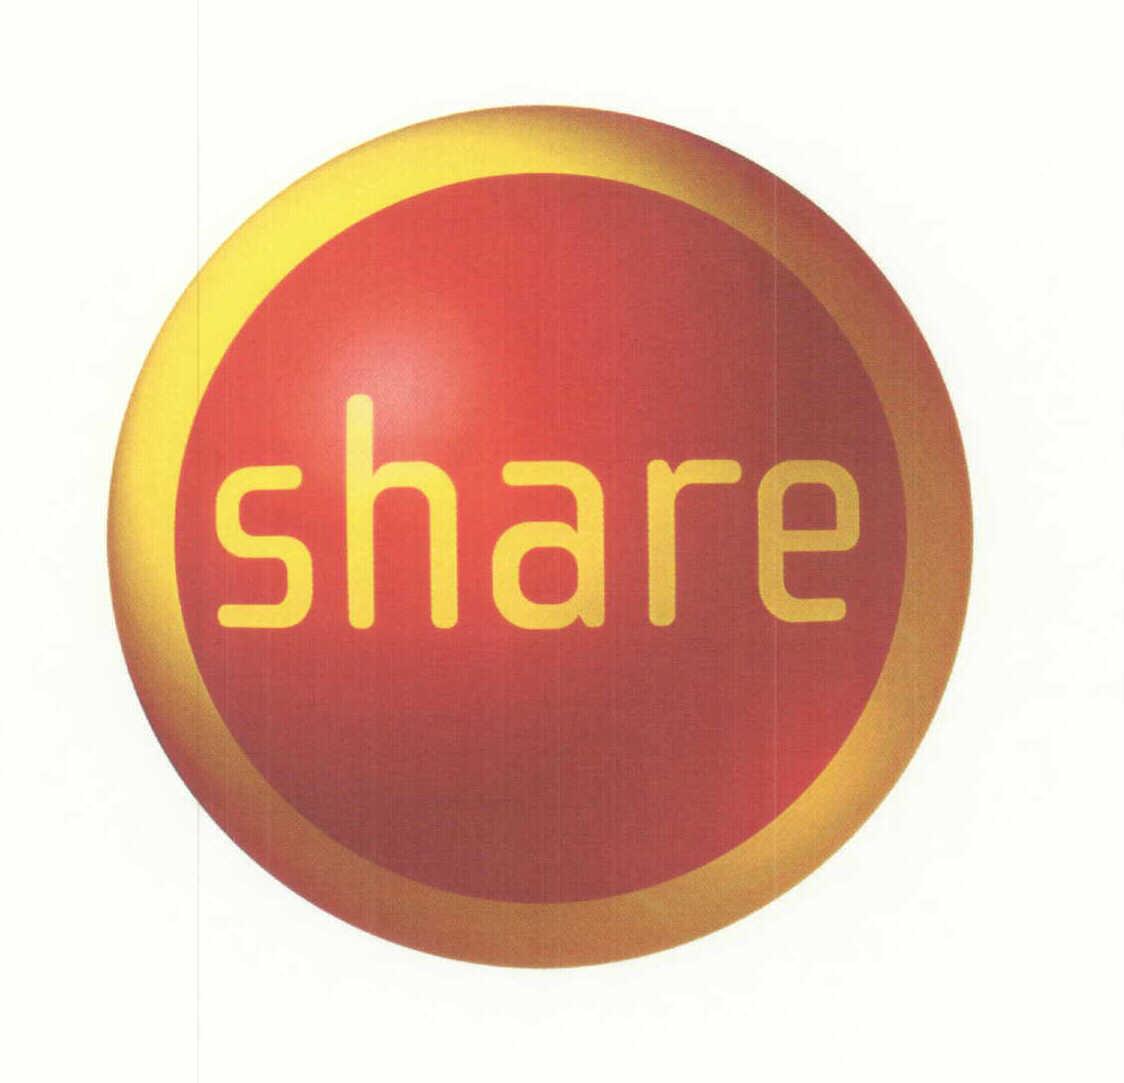 Share Eastman Kodak Company Trademark Registration